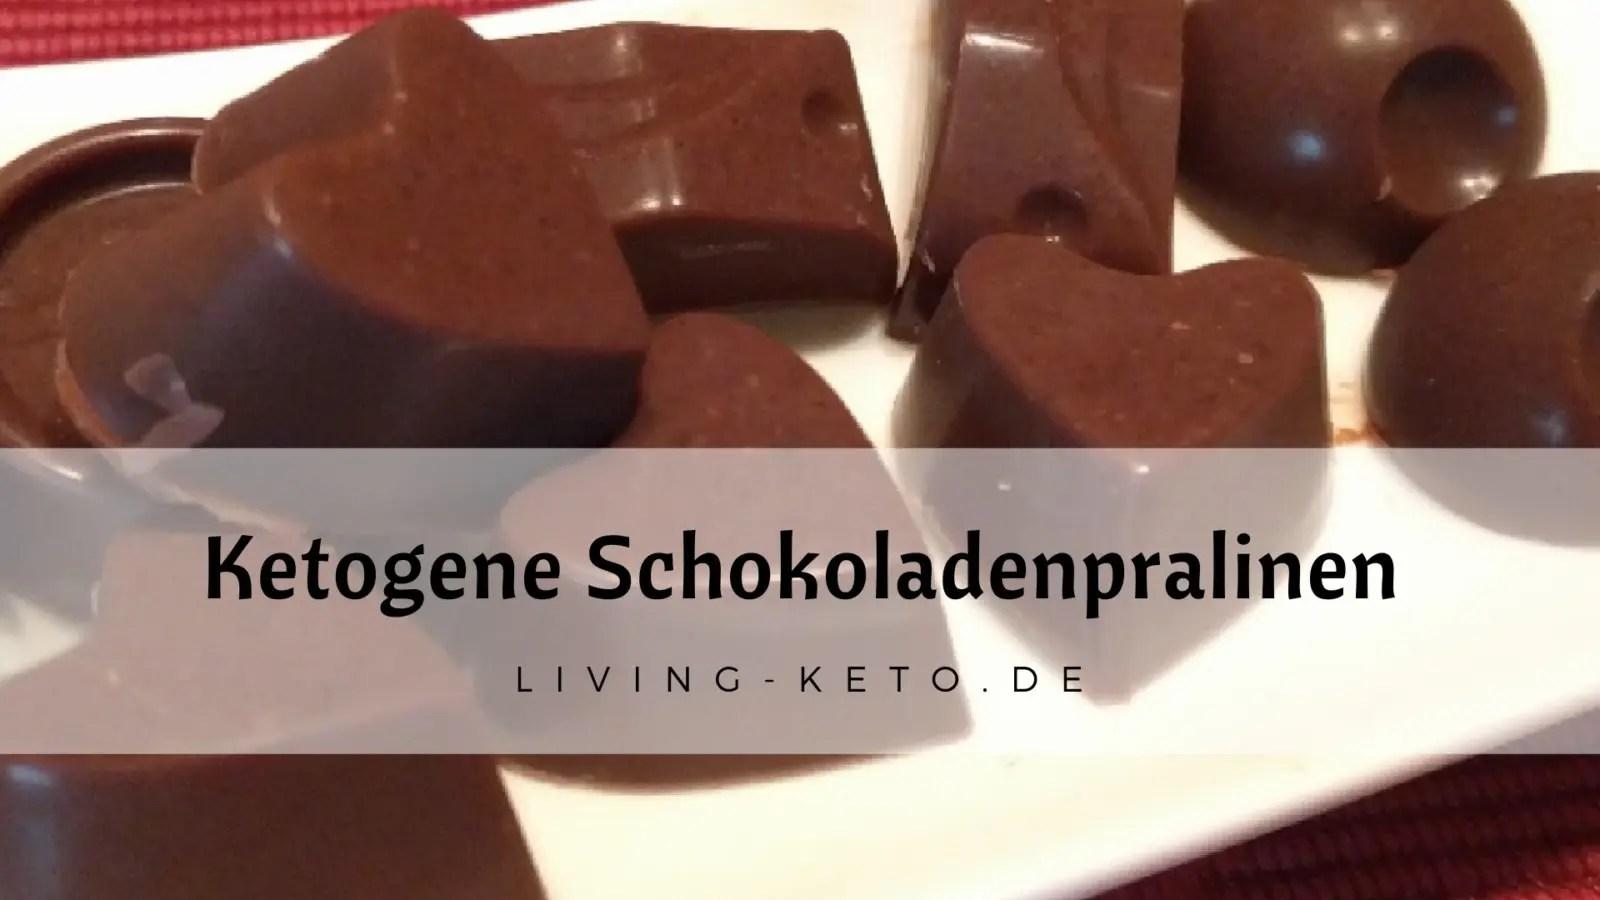 Read more about the article Ketogene Schokoladenpralinen